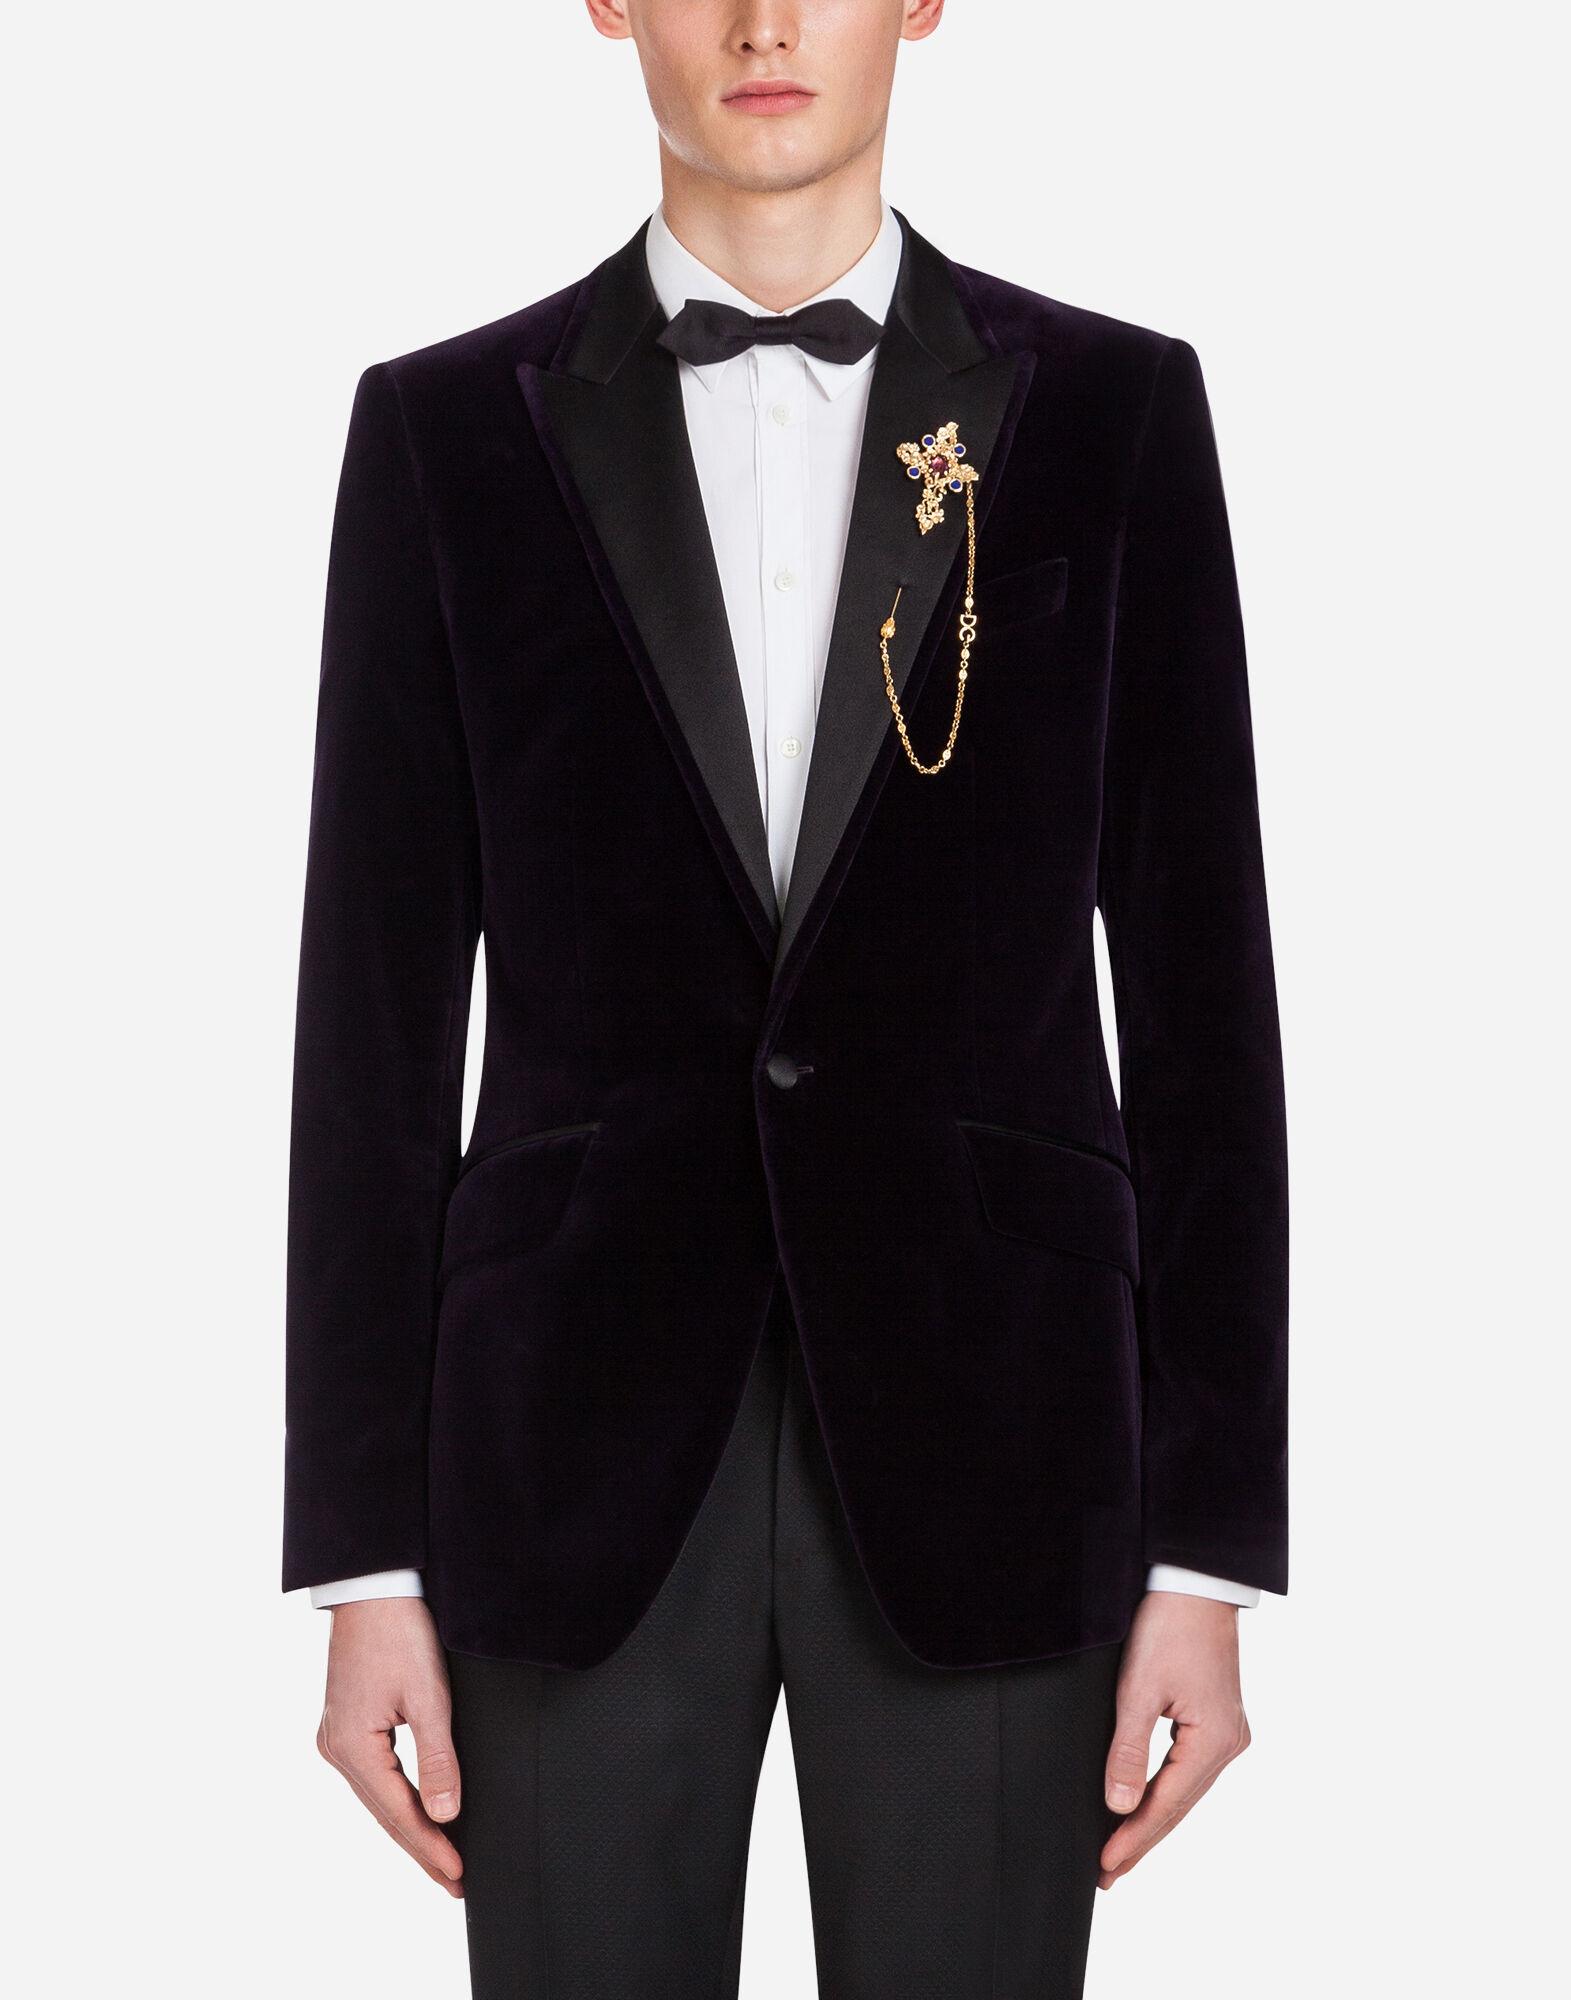 Giacche e Blazer da Uomo | Dolce&Gabbana GIACCA TUXEDO IN VELLUTO